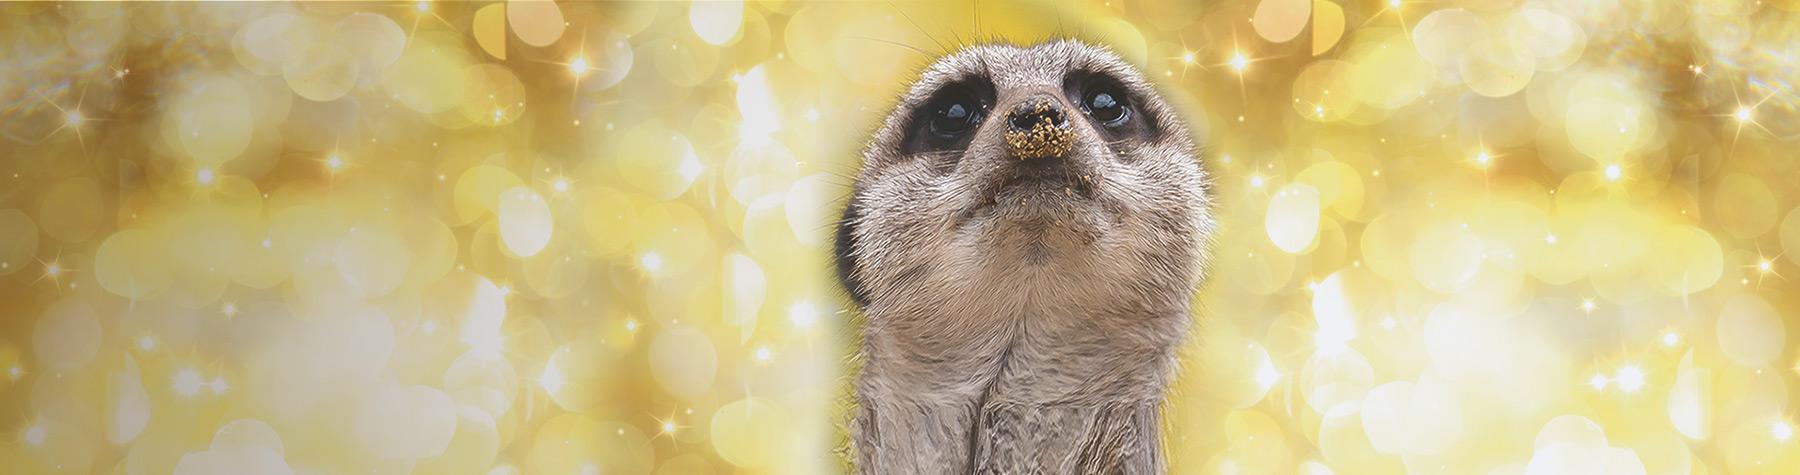 main-image-meerkats-christmas-1